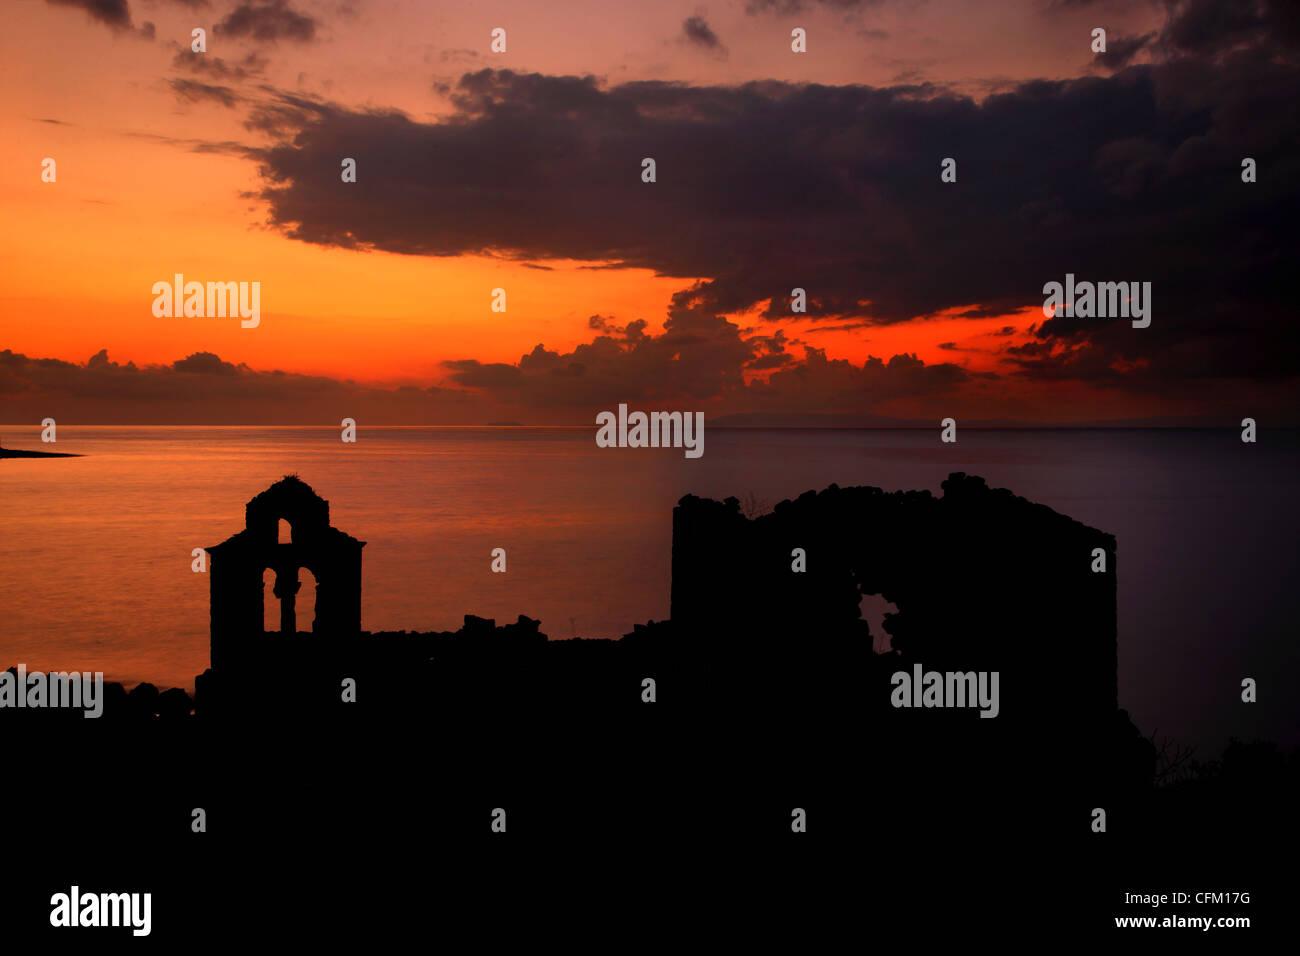 Sunset at the abandoned monastery of Panagia Vretti, Limeni village, Mani, Lakonia, Peloponnese, Greece - Stock Image